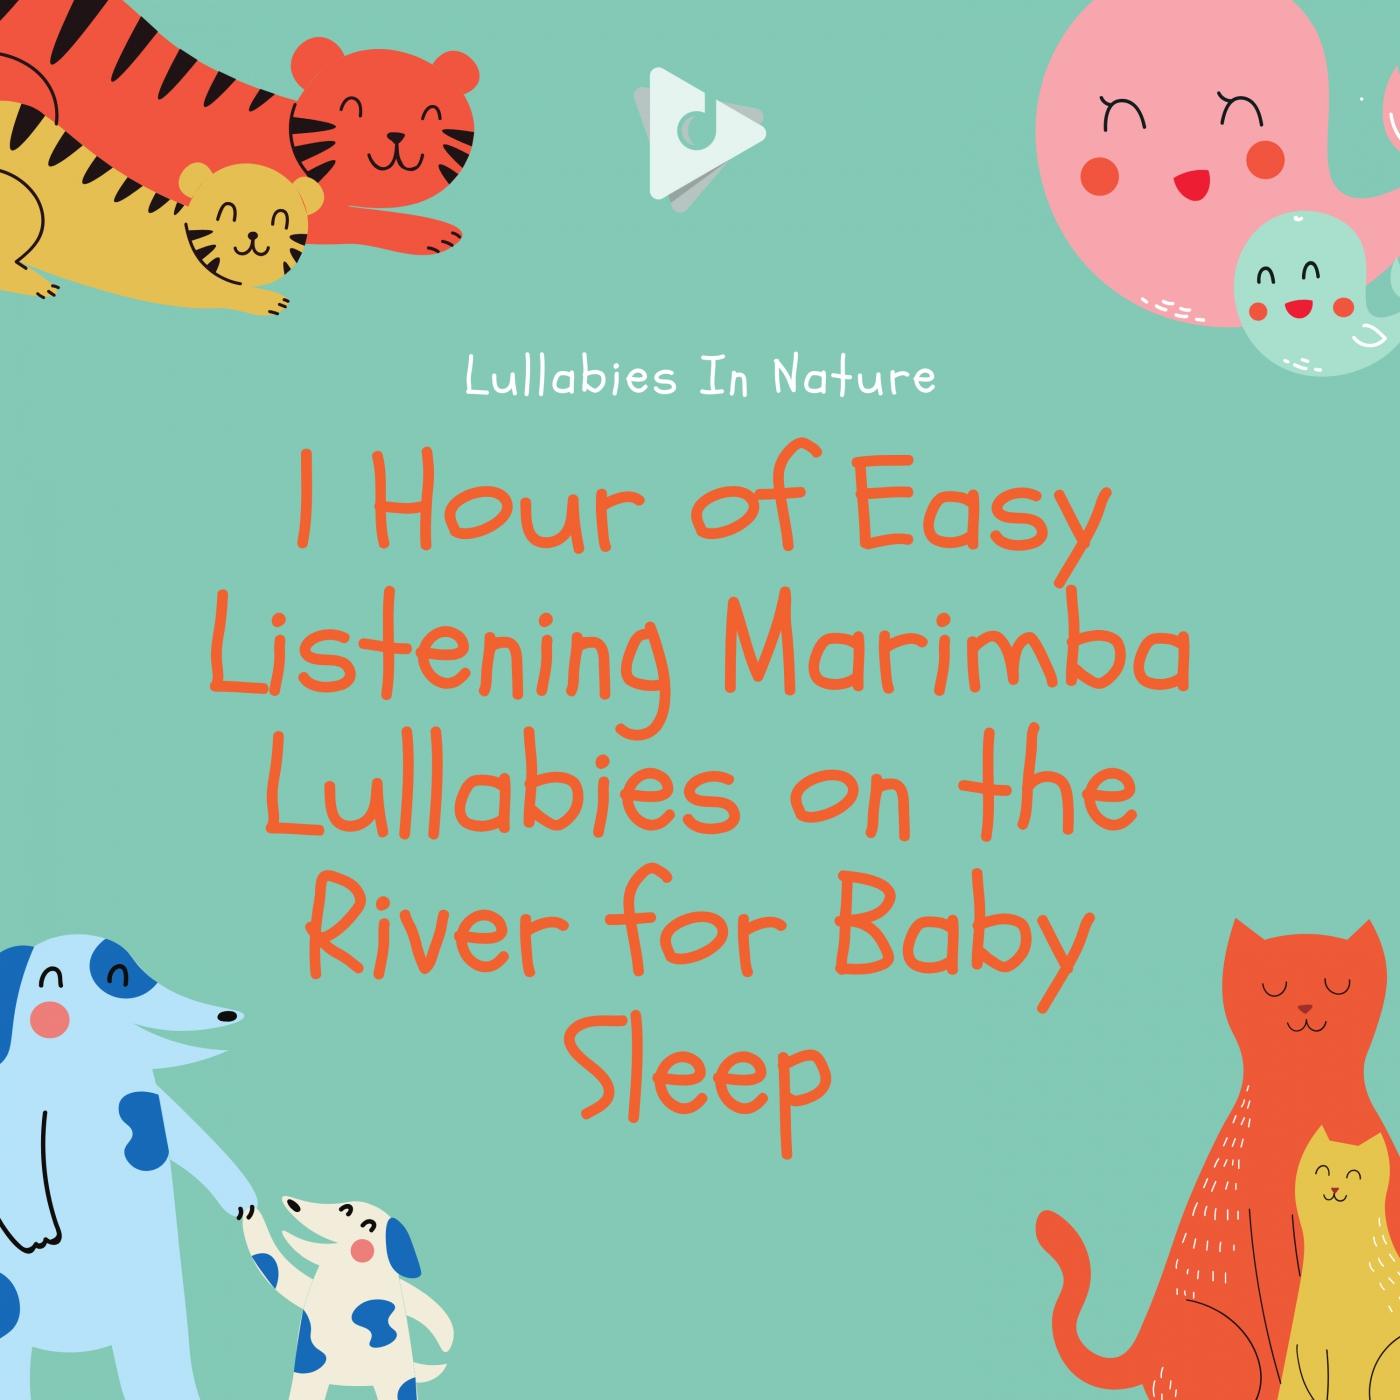 1 Hour of Easy Listening Marimba Lullabies on the River for Baby Sleep